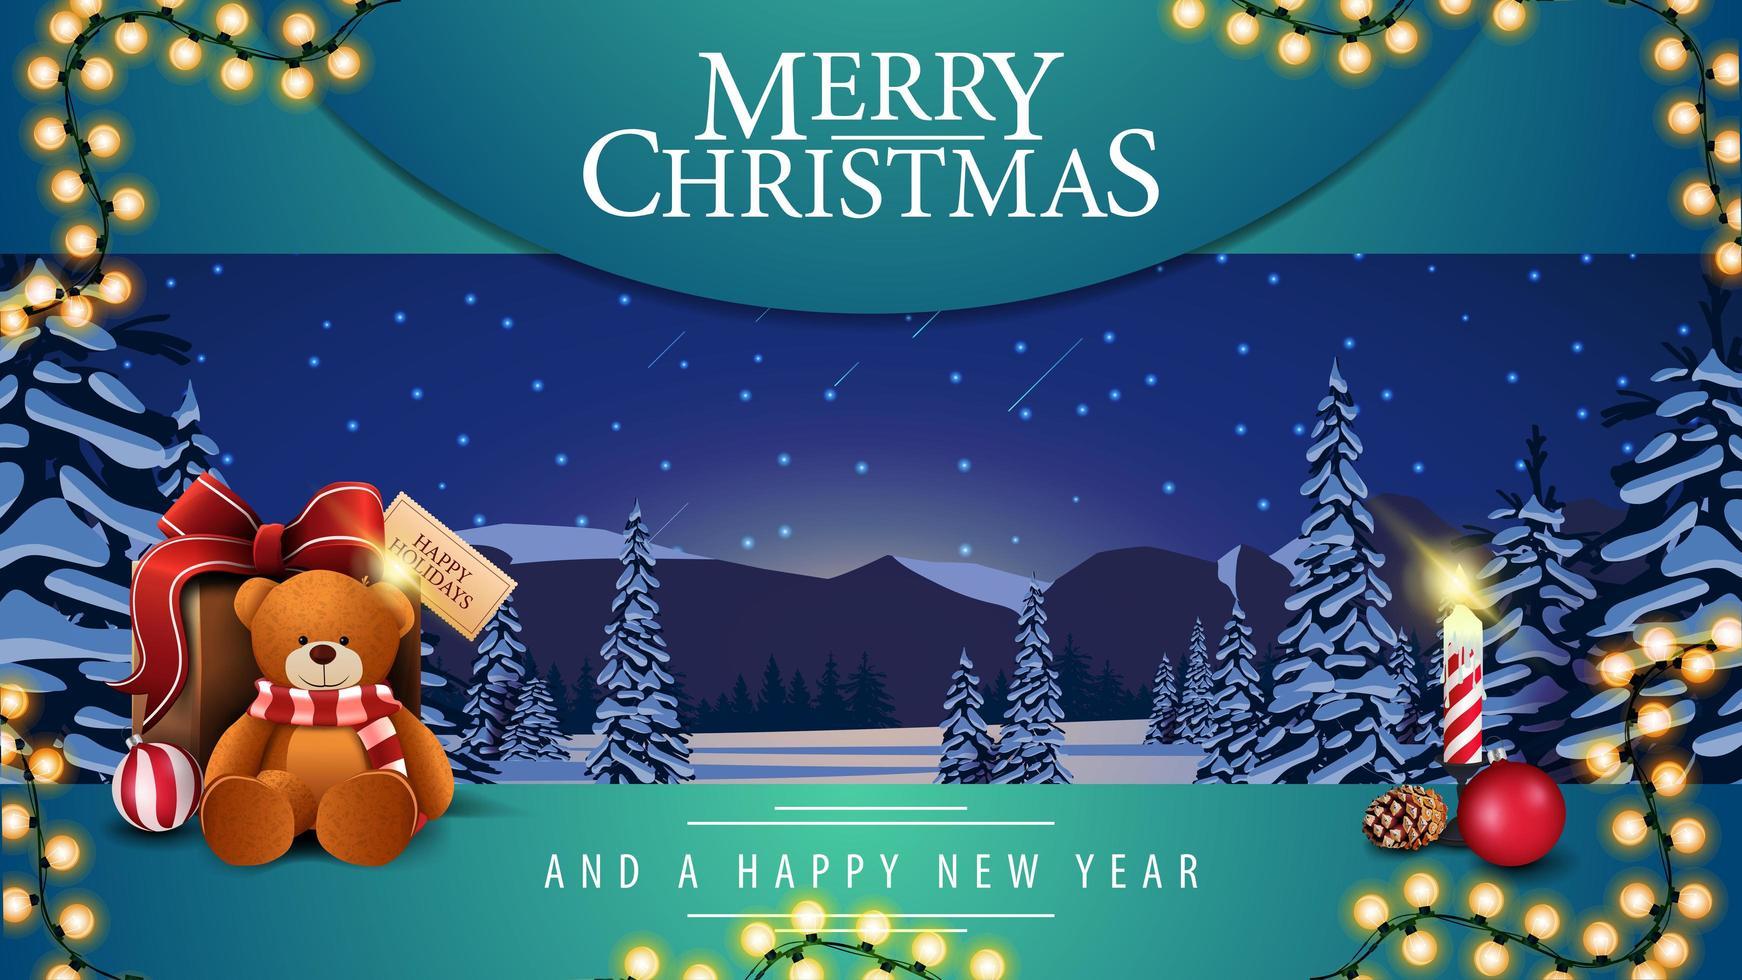 feliz natal e um feliz ano novo postal vetor